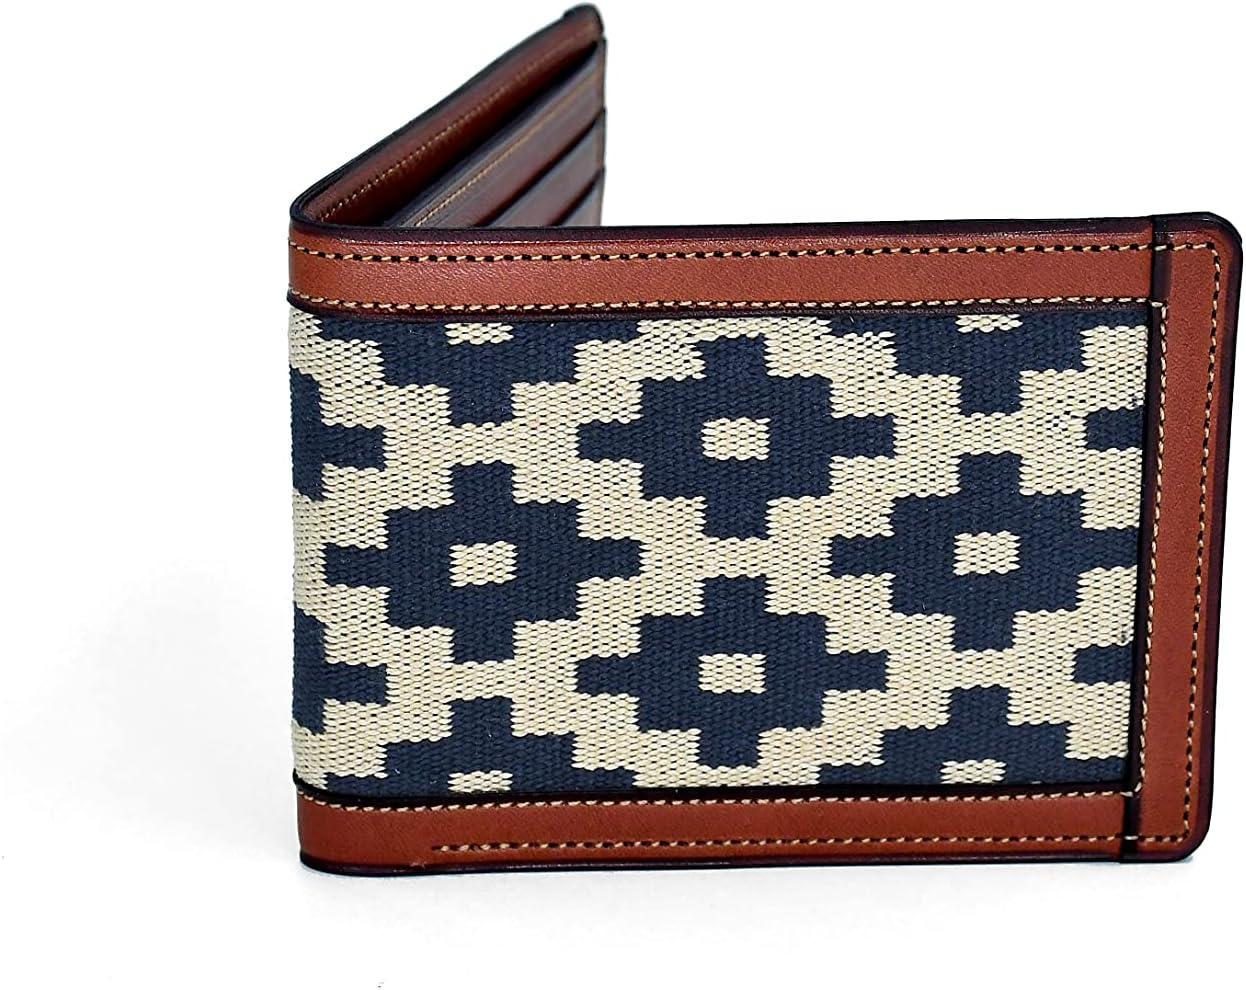 GauchoLife Guarda Pampas Leather Bi-Fold Wallet (Cross/Tan)